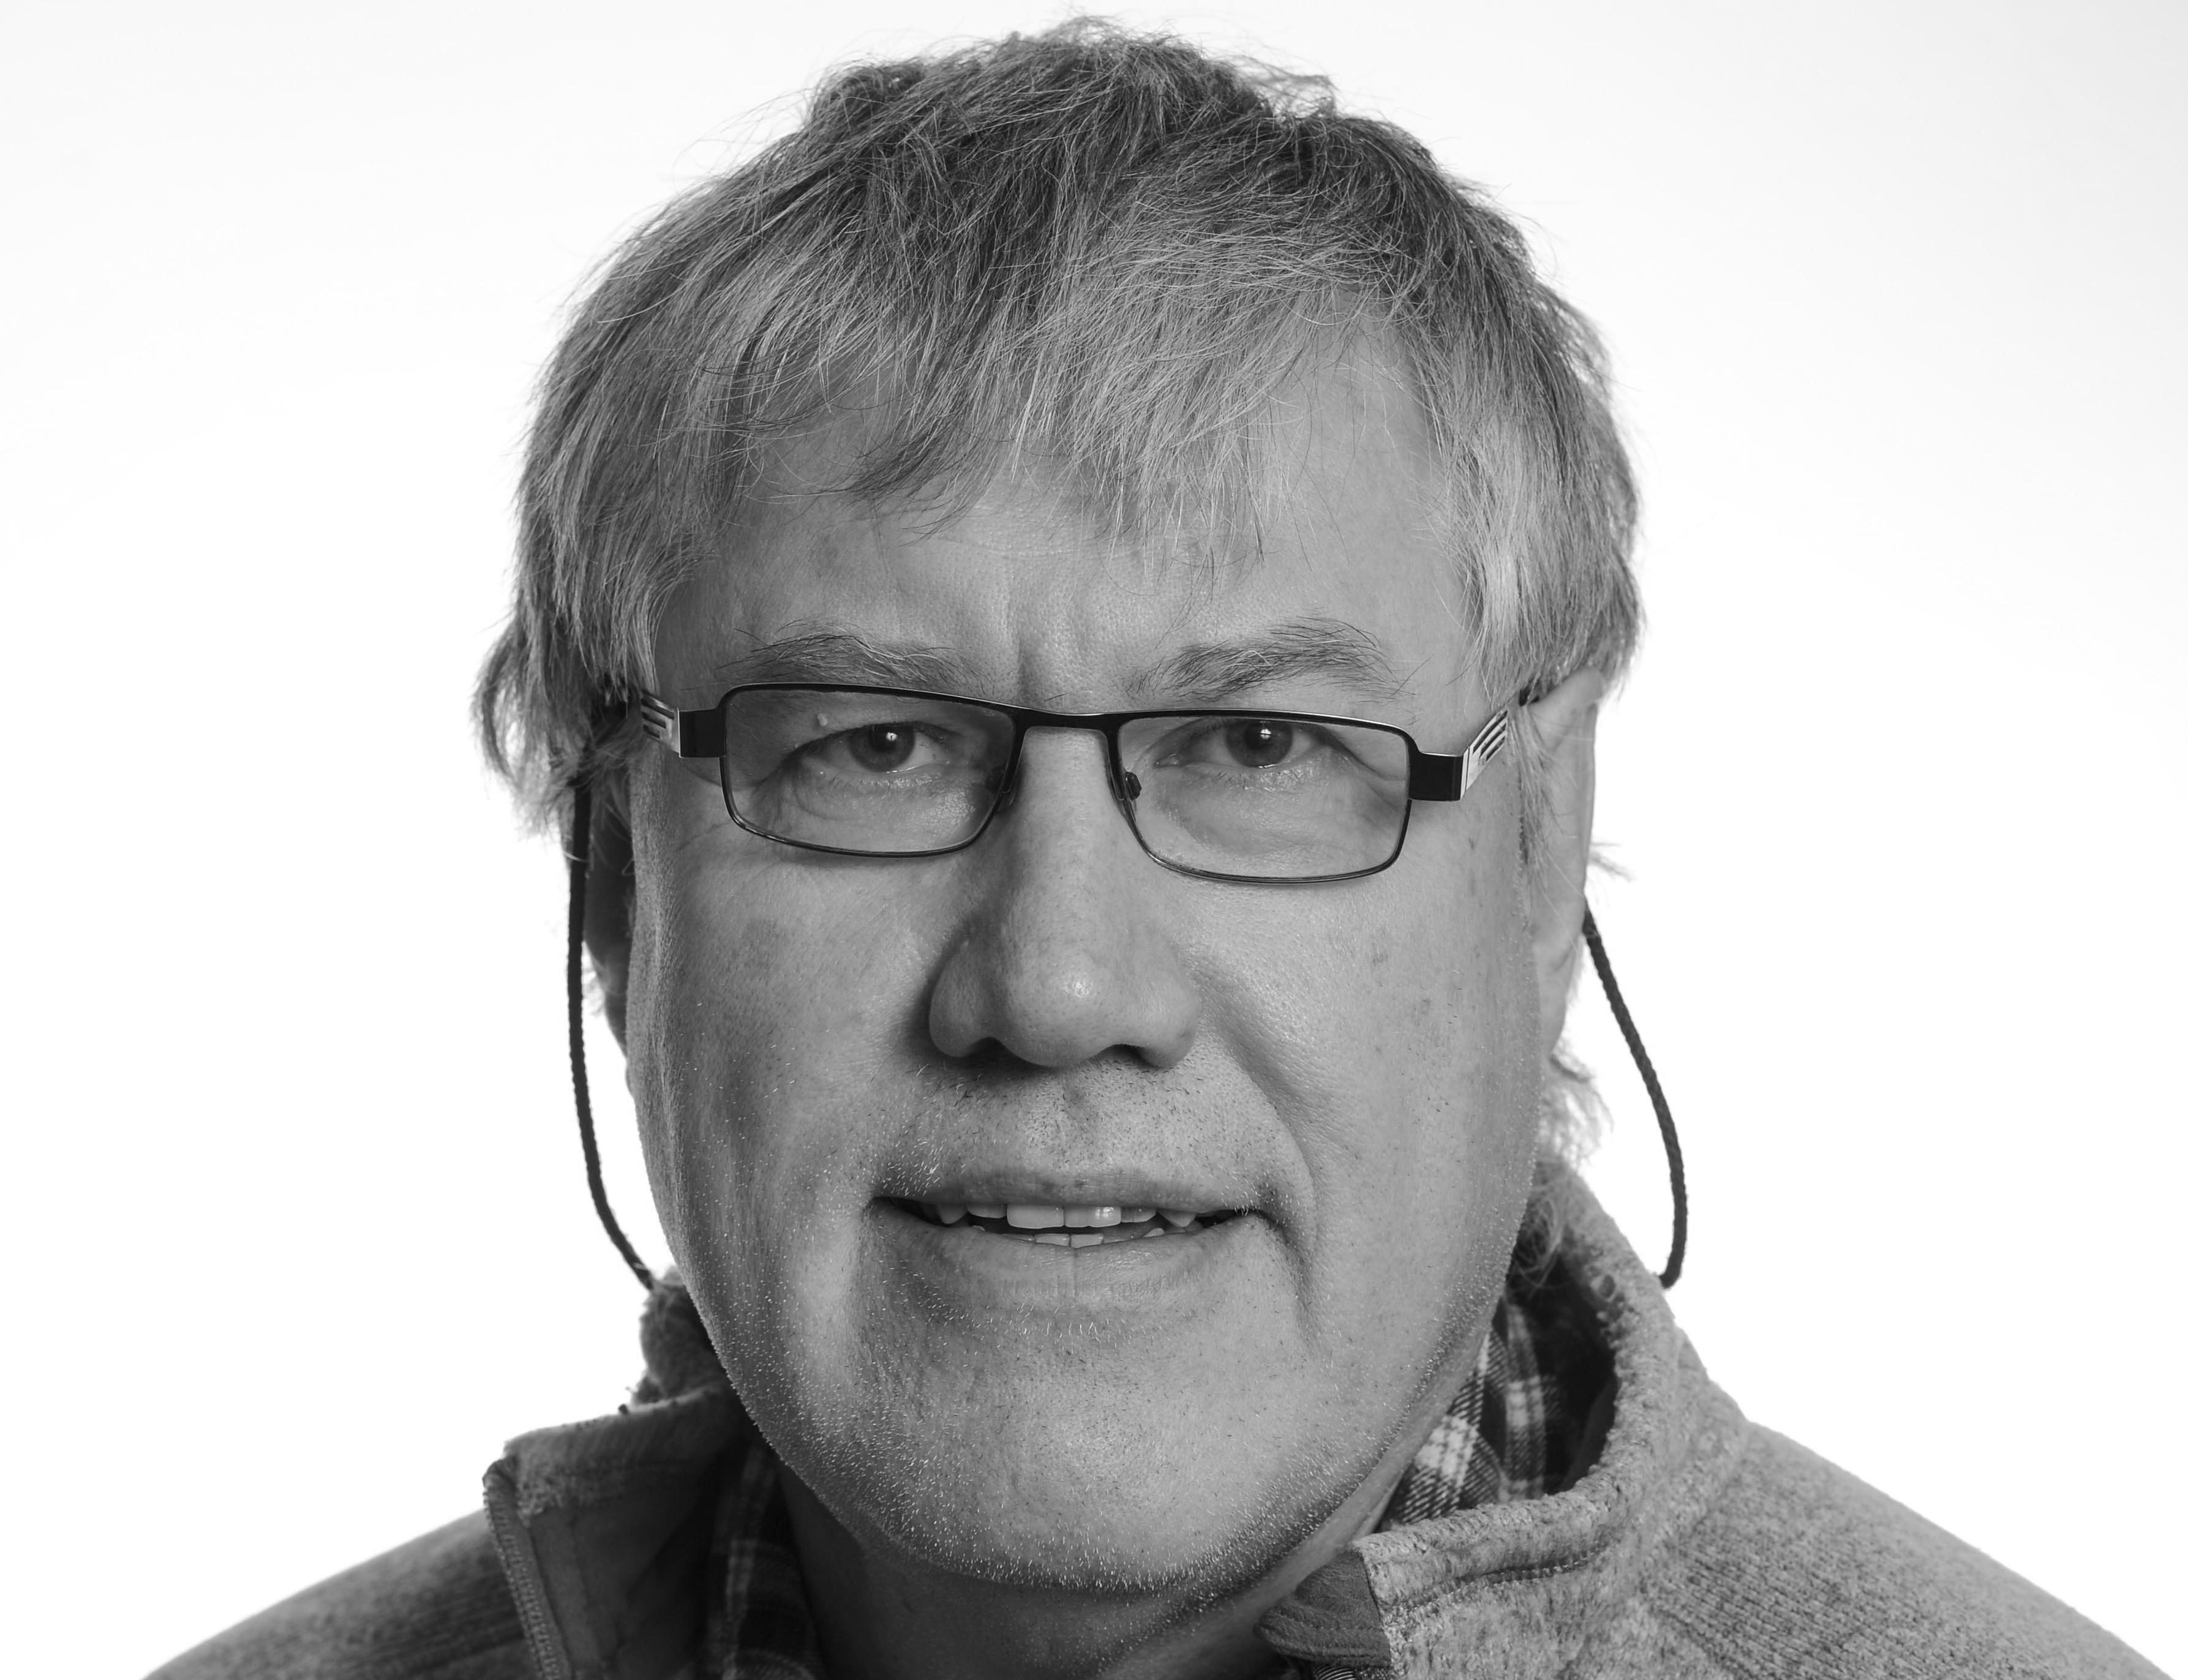 Håvard Gautneb